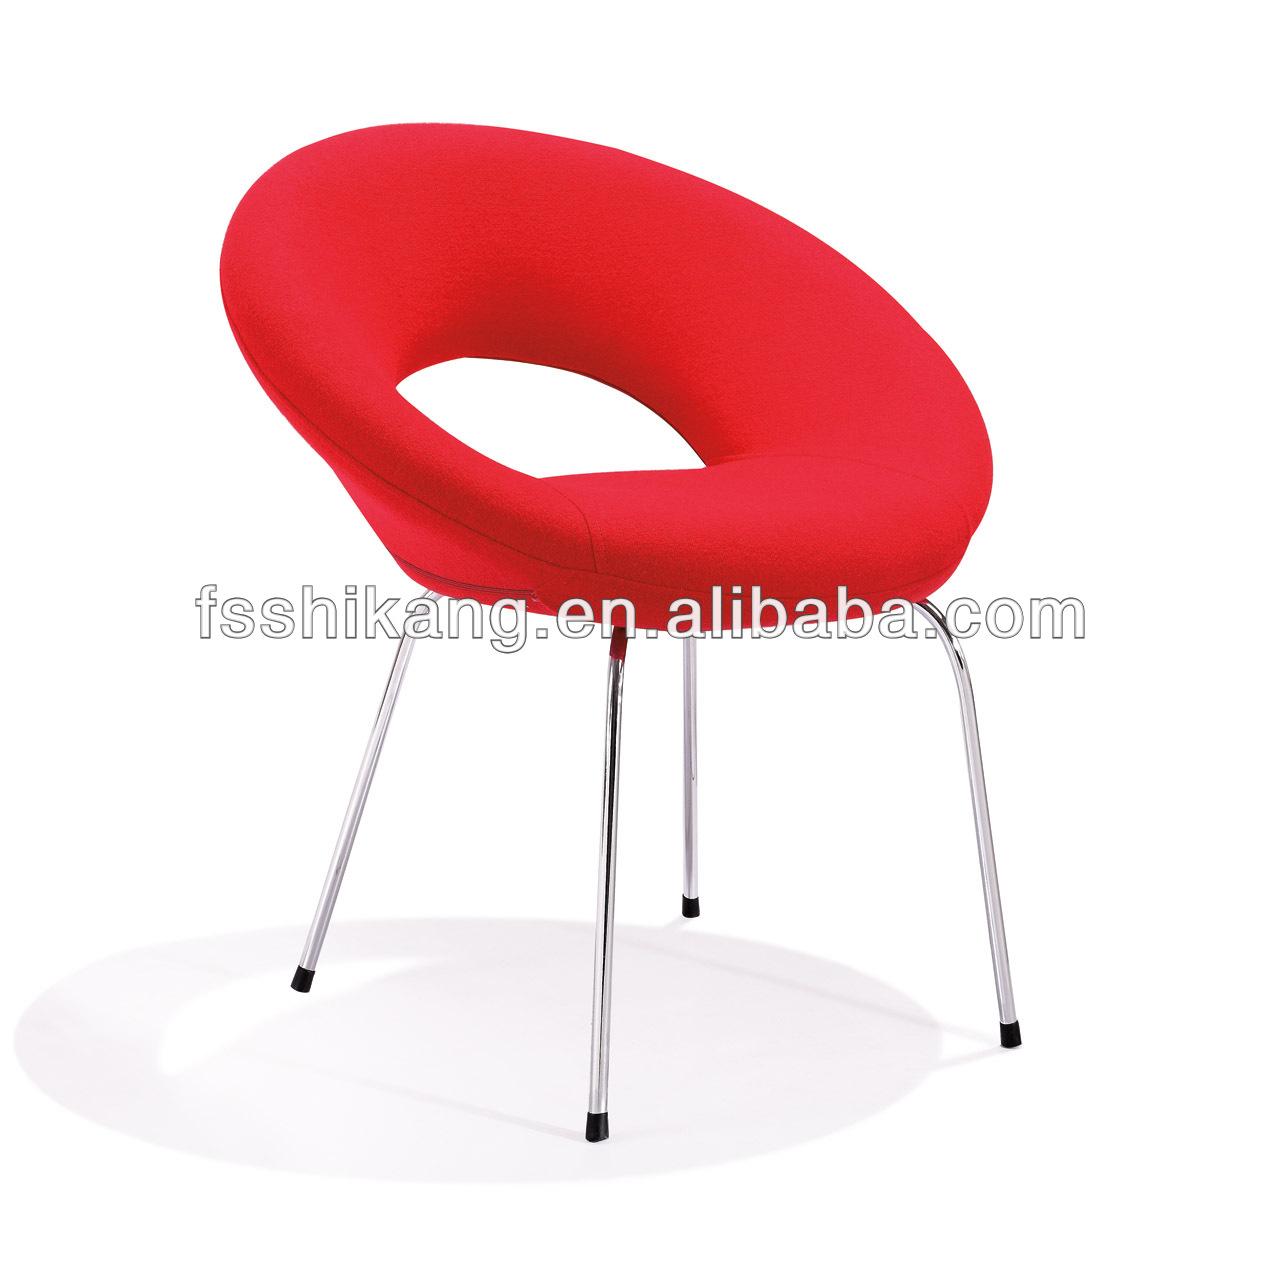 Salon furniture modern classical dome chairs for sale for Modern salon chairs for sale